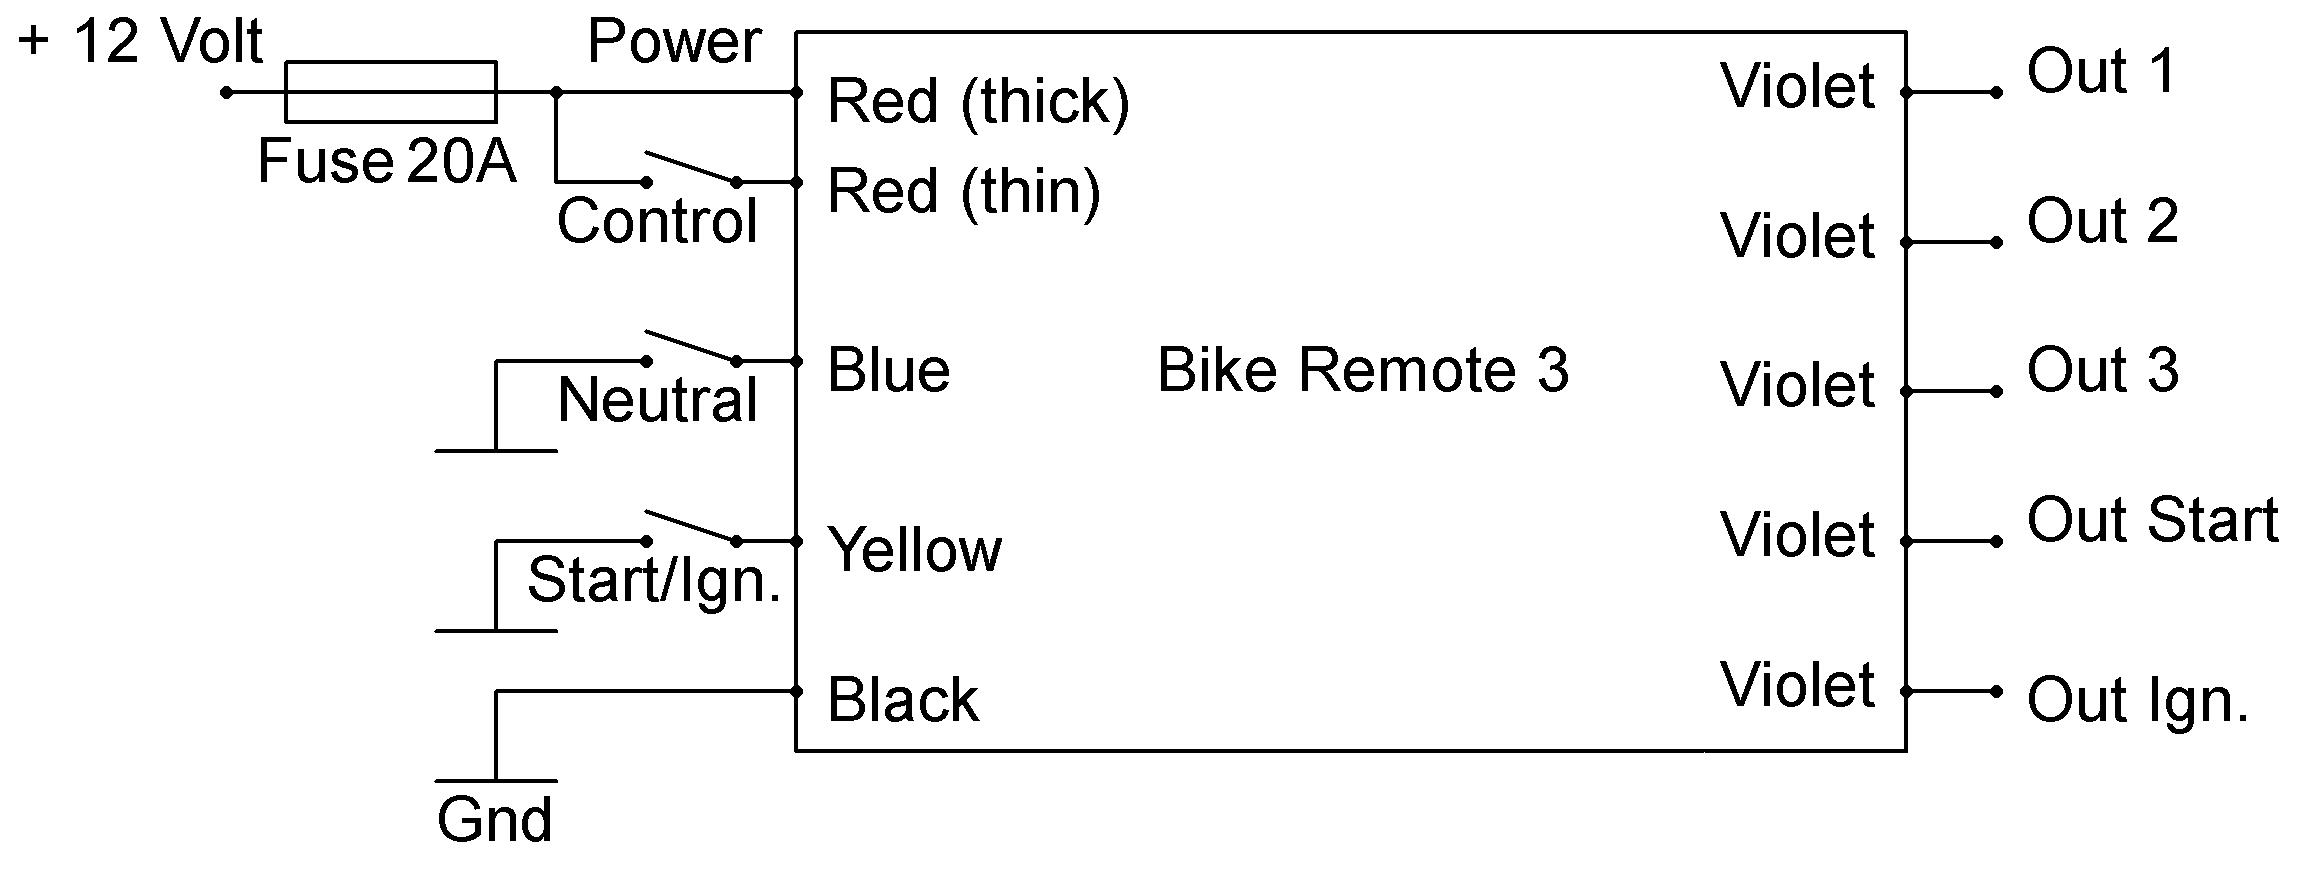 Bike Remote 3